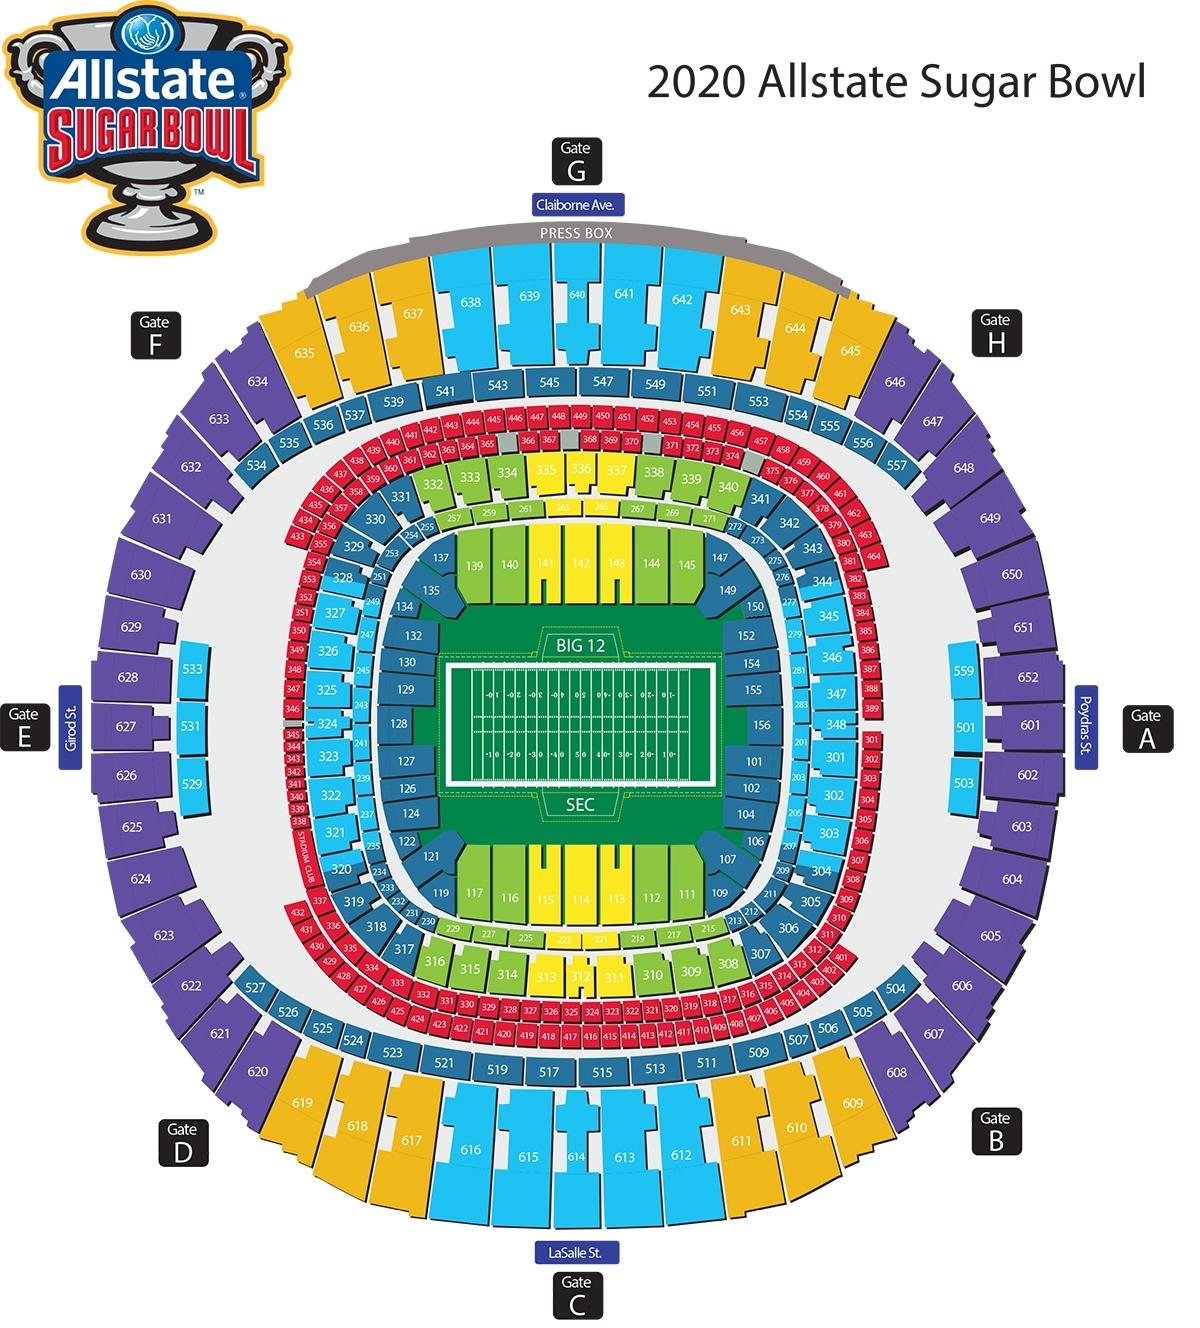 Seating Diagram - Official Site Of The Allstate Sugar Bowl regarding Super Bowl Stadium 2019 Seating Chart